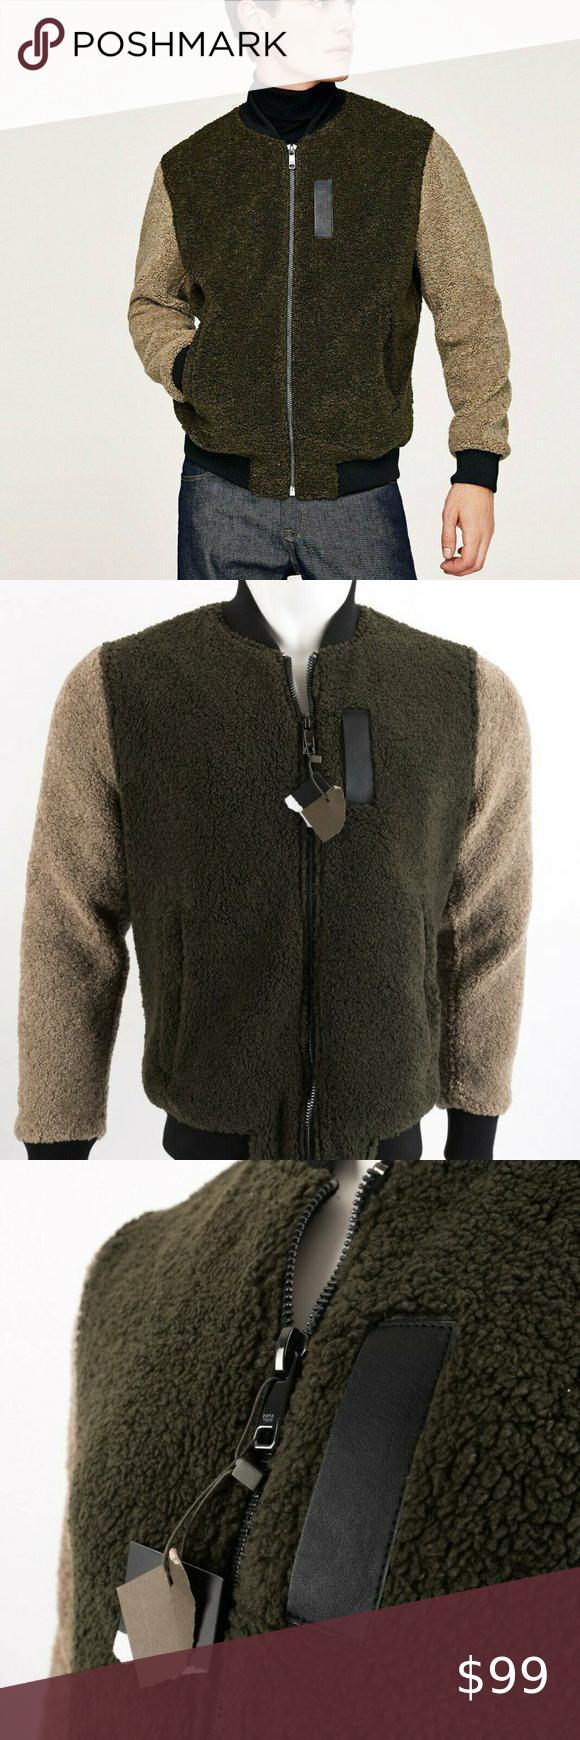 Zara Mens Bomber Jacket Coat Small Fuzzy Green Tan Stylish Bomber Jacket Faux Leather Bomber Jacket Womens Denim Jumpsuit [ 1740 x 580 Pixel ]